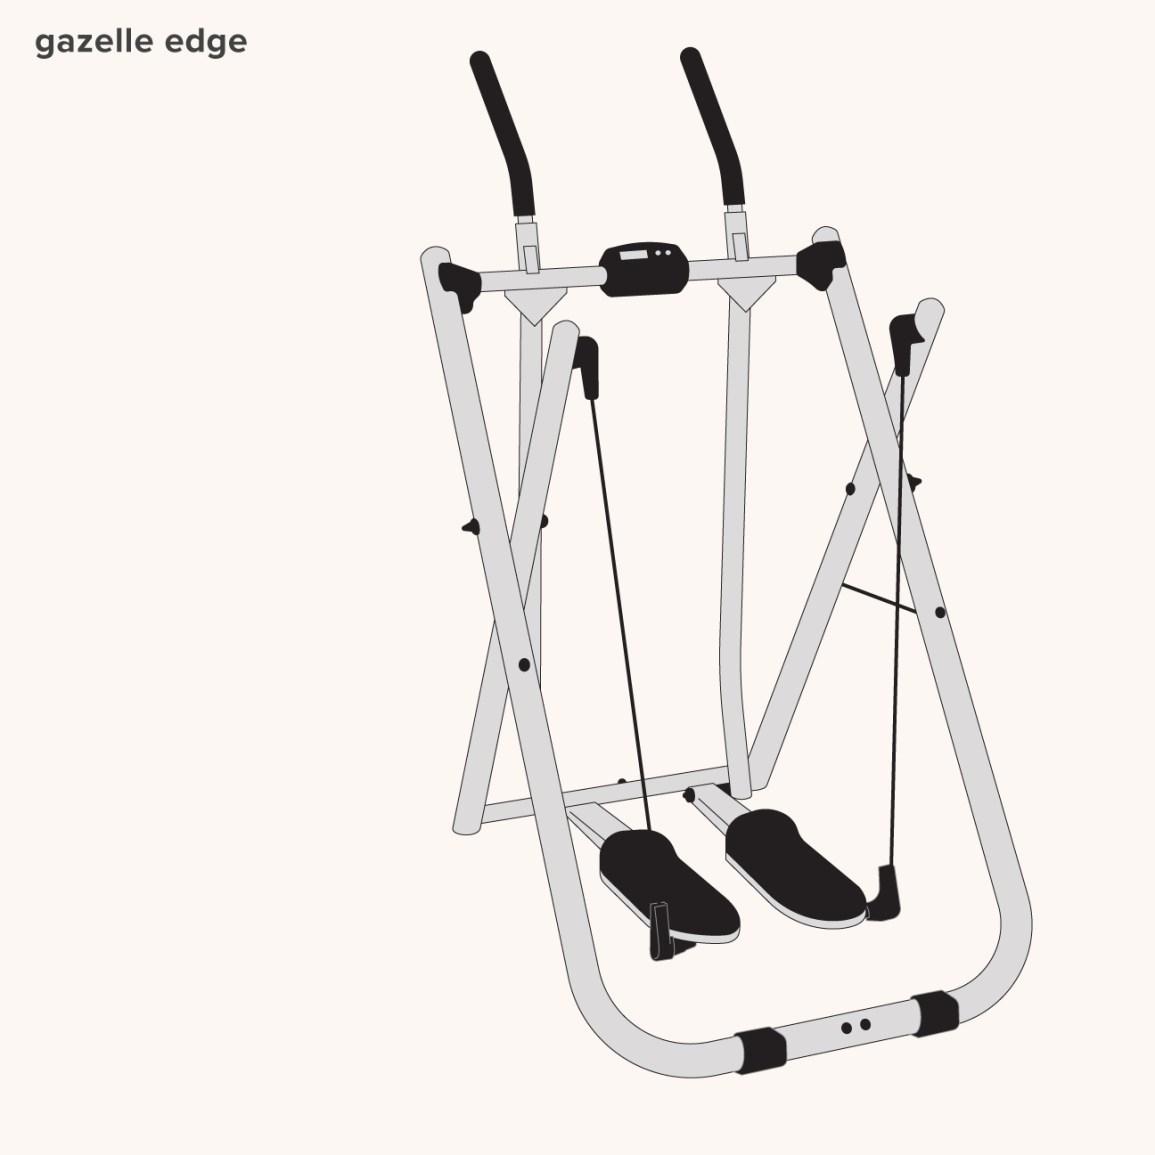 Gazelle Exercise Machine >> Gazelle Exercise Machine How Effective Is It